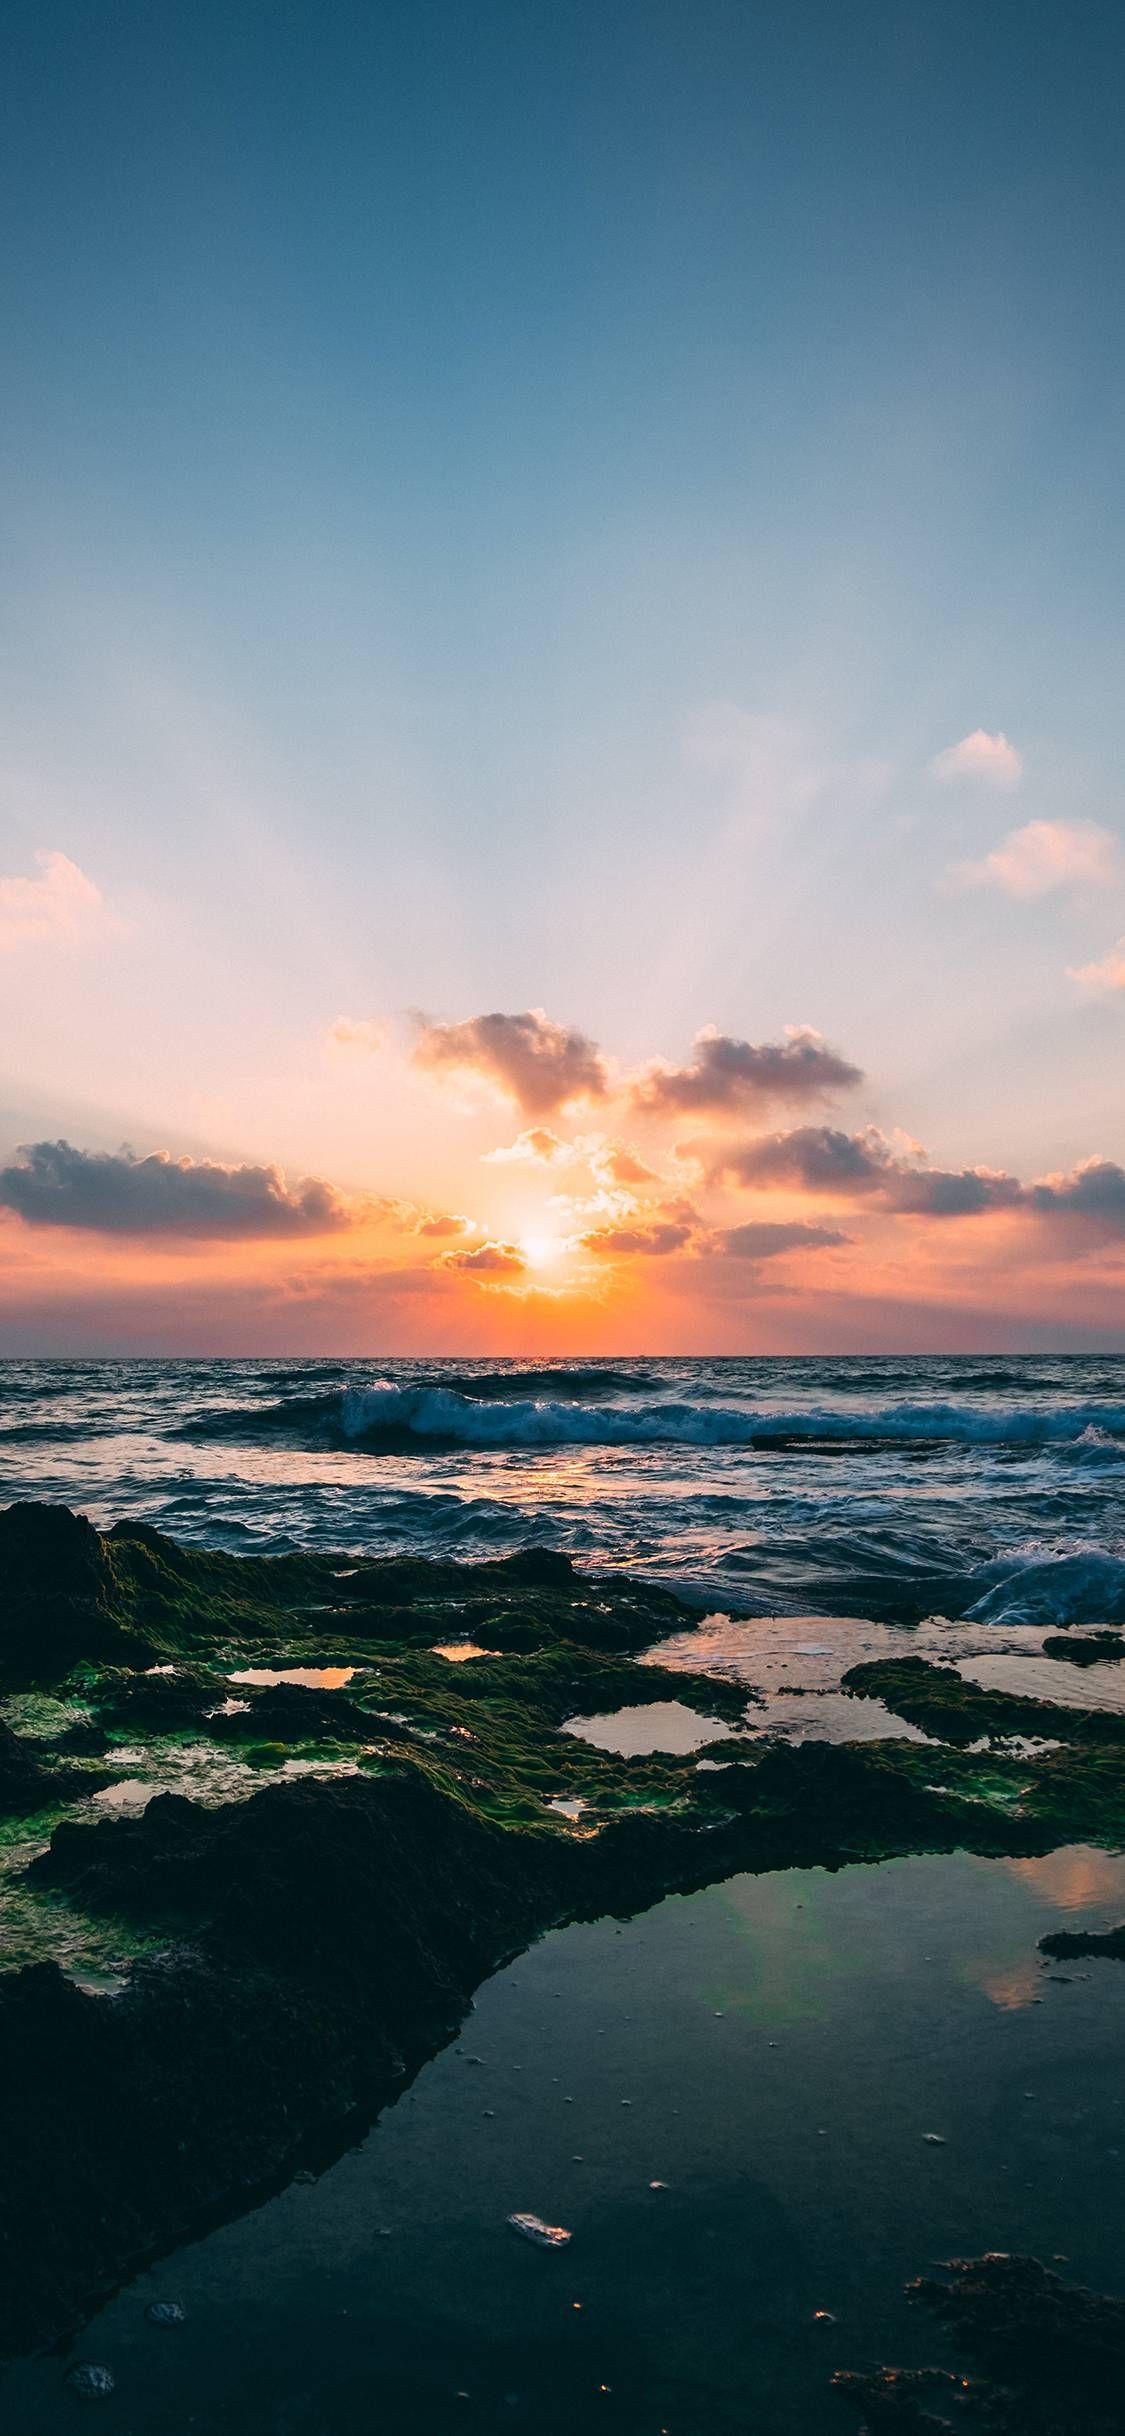 Ocean wave of sea of sunshine of the setting sun